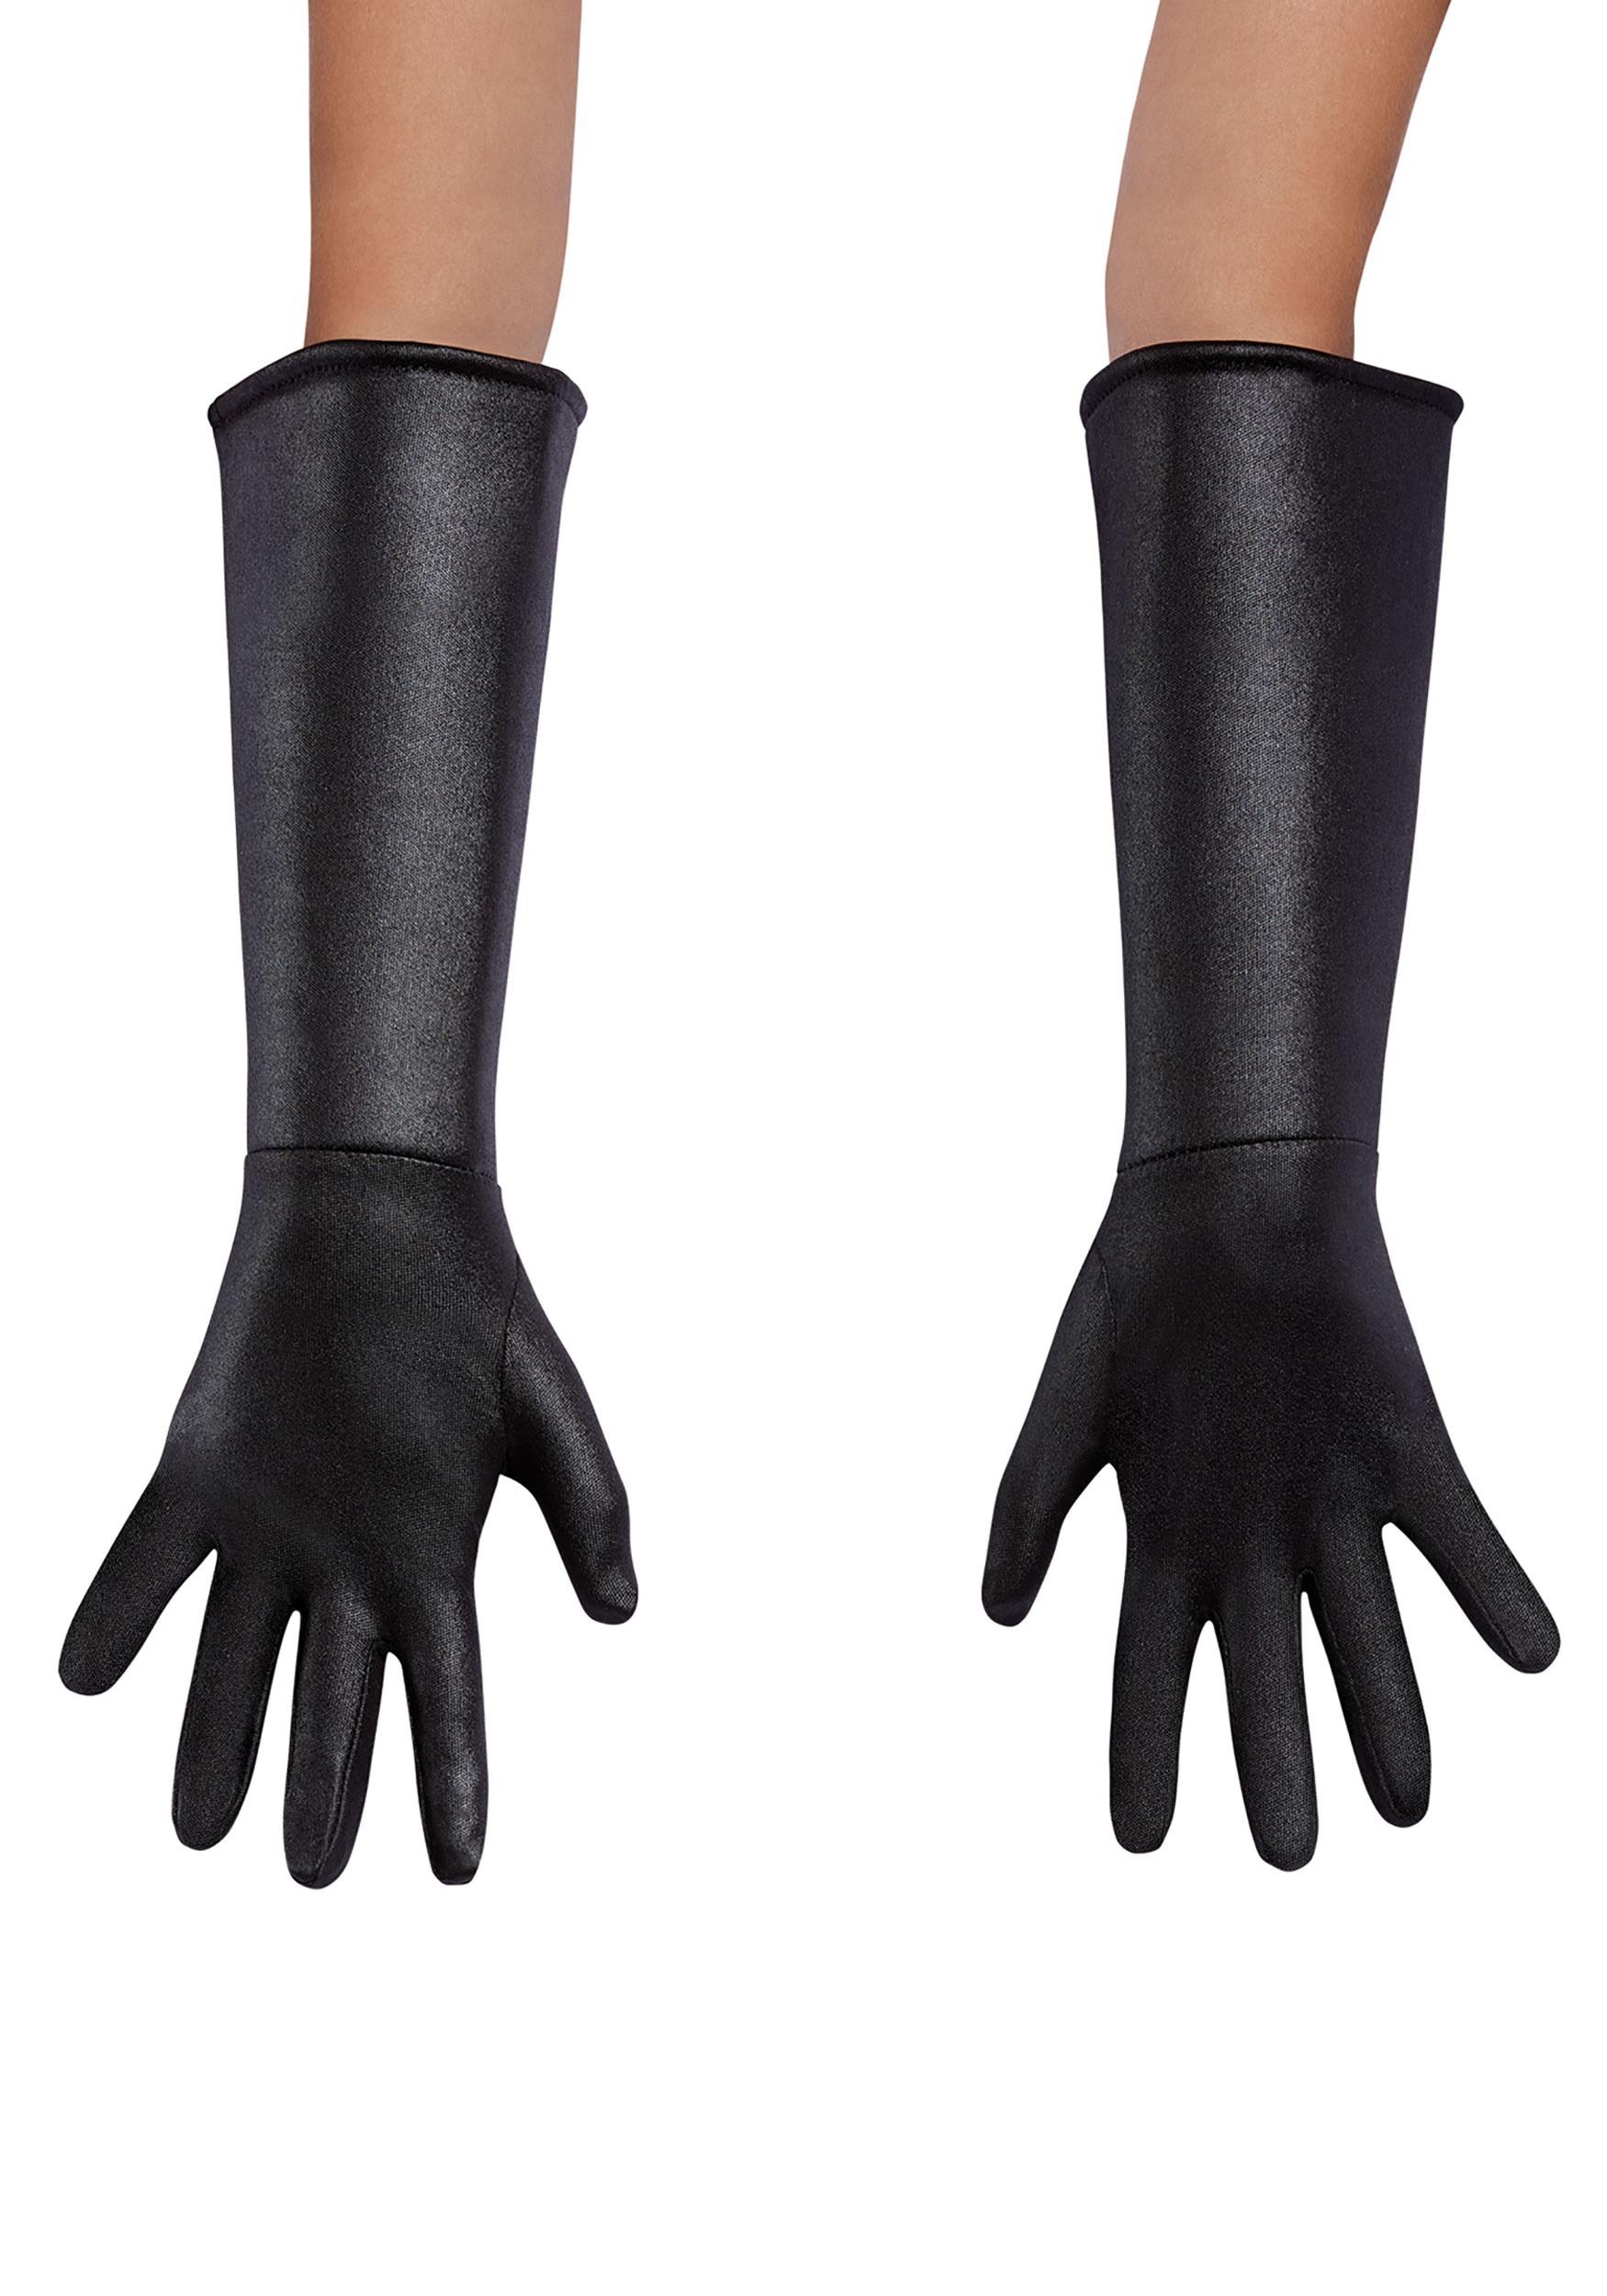 Disney Incredibles 2 Gloves for Kids